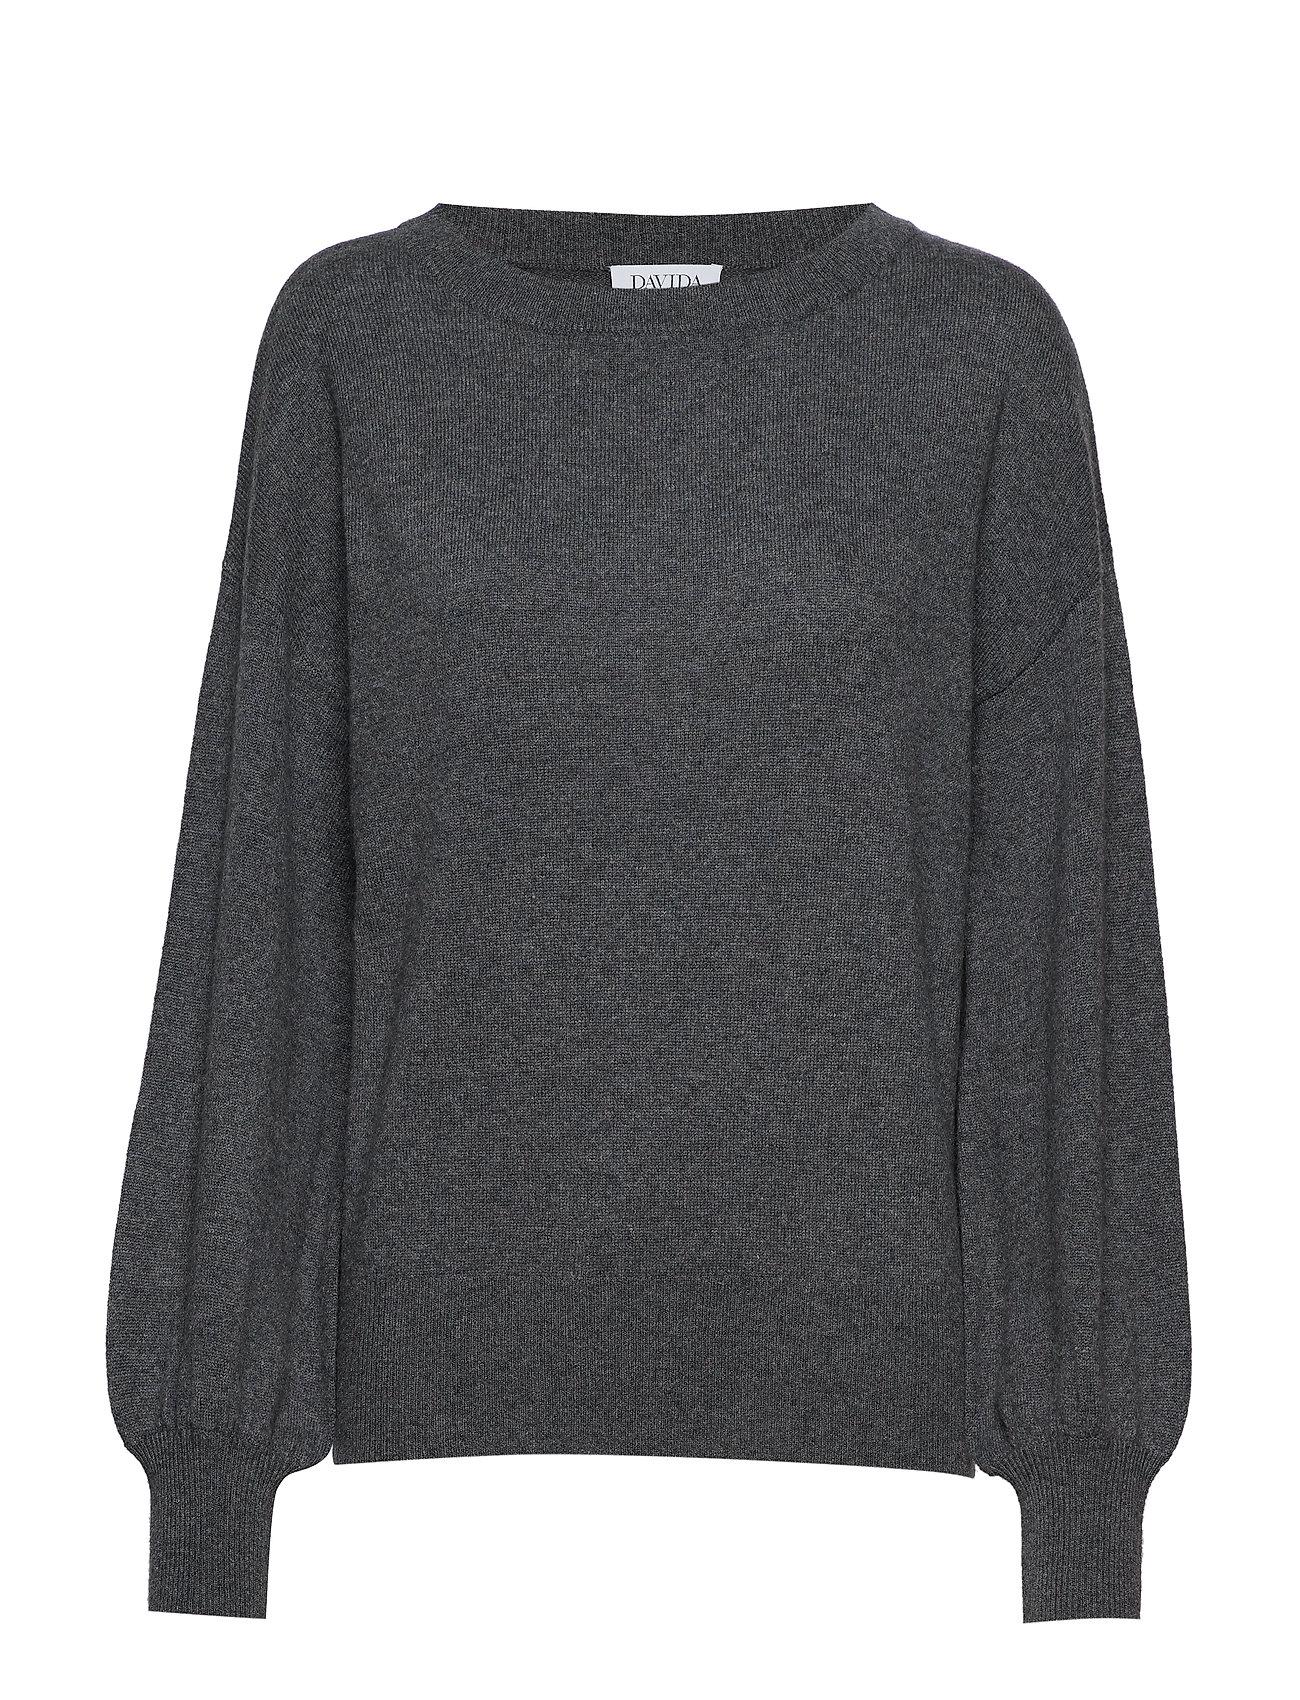 Davida Cashmere Balloon Sleeve Sweater - DARK GREY